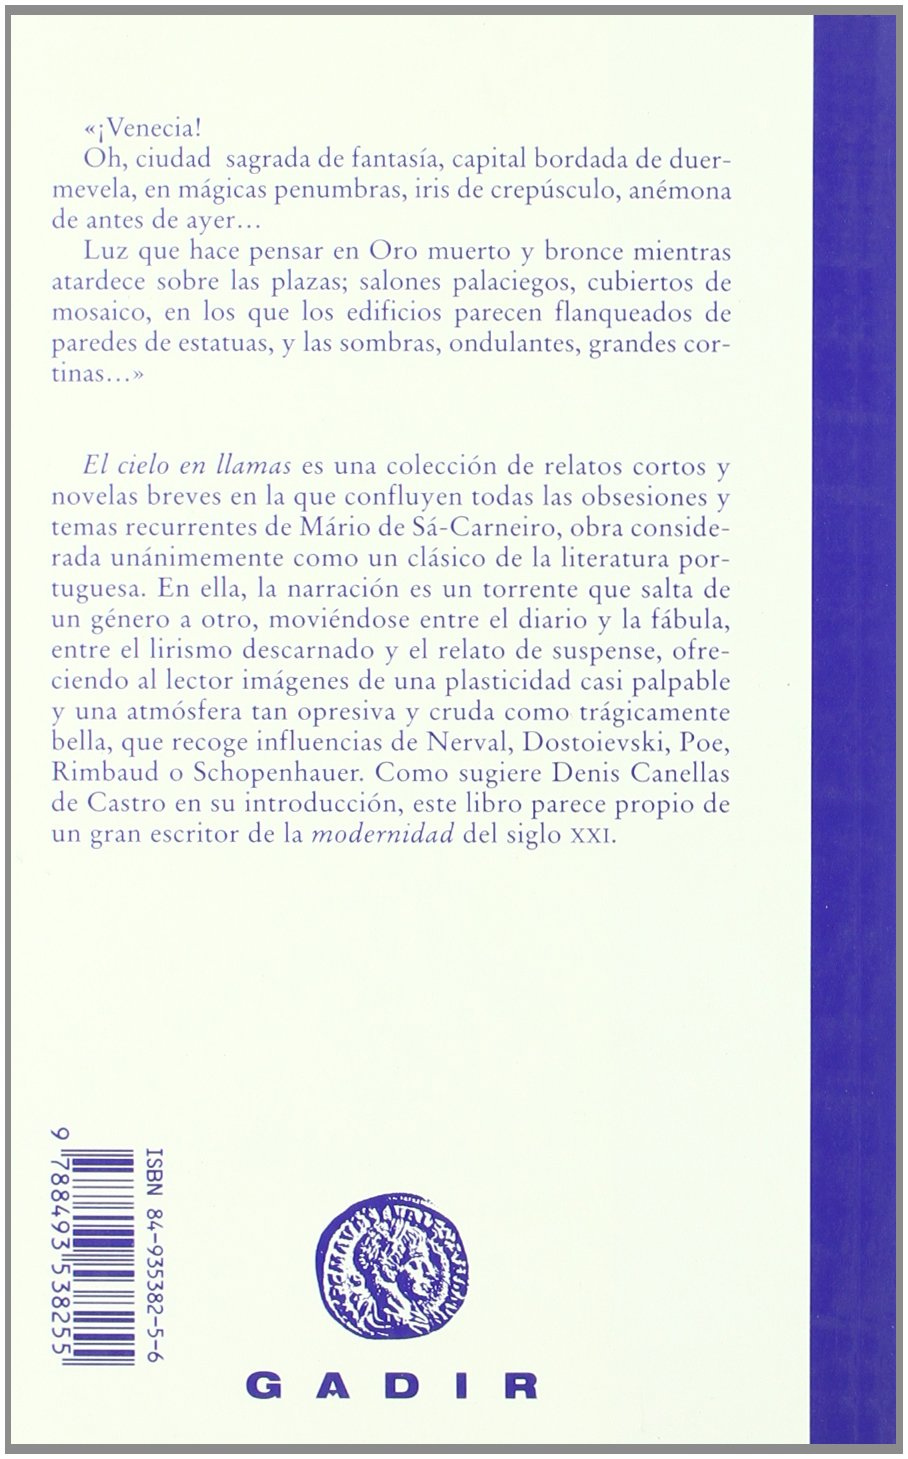 El cielo en llamas (Spanish Edition): Màrio de Sà-Carneiro: 9788493538255: Amazon.com: Books